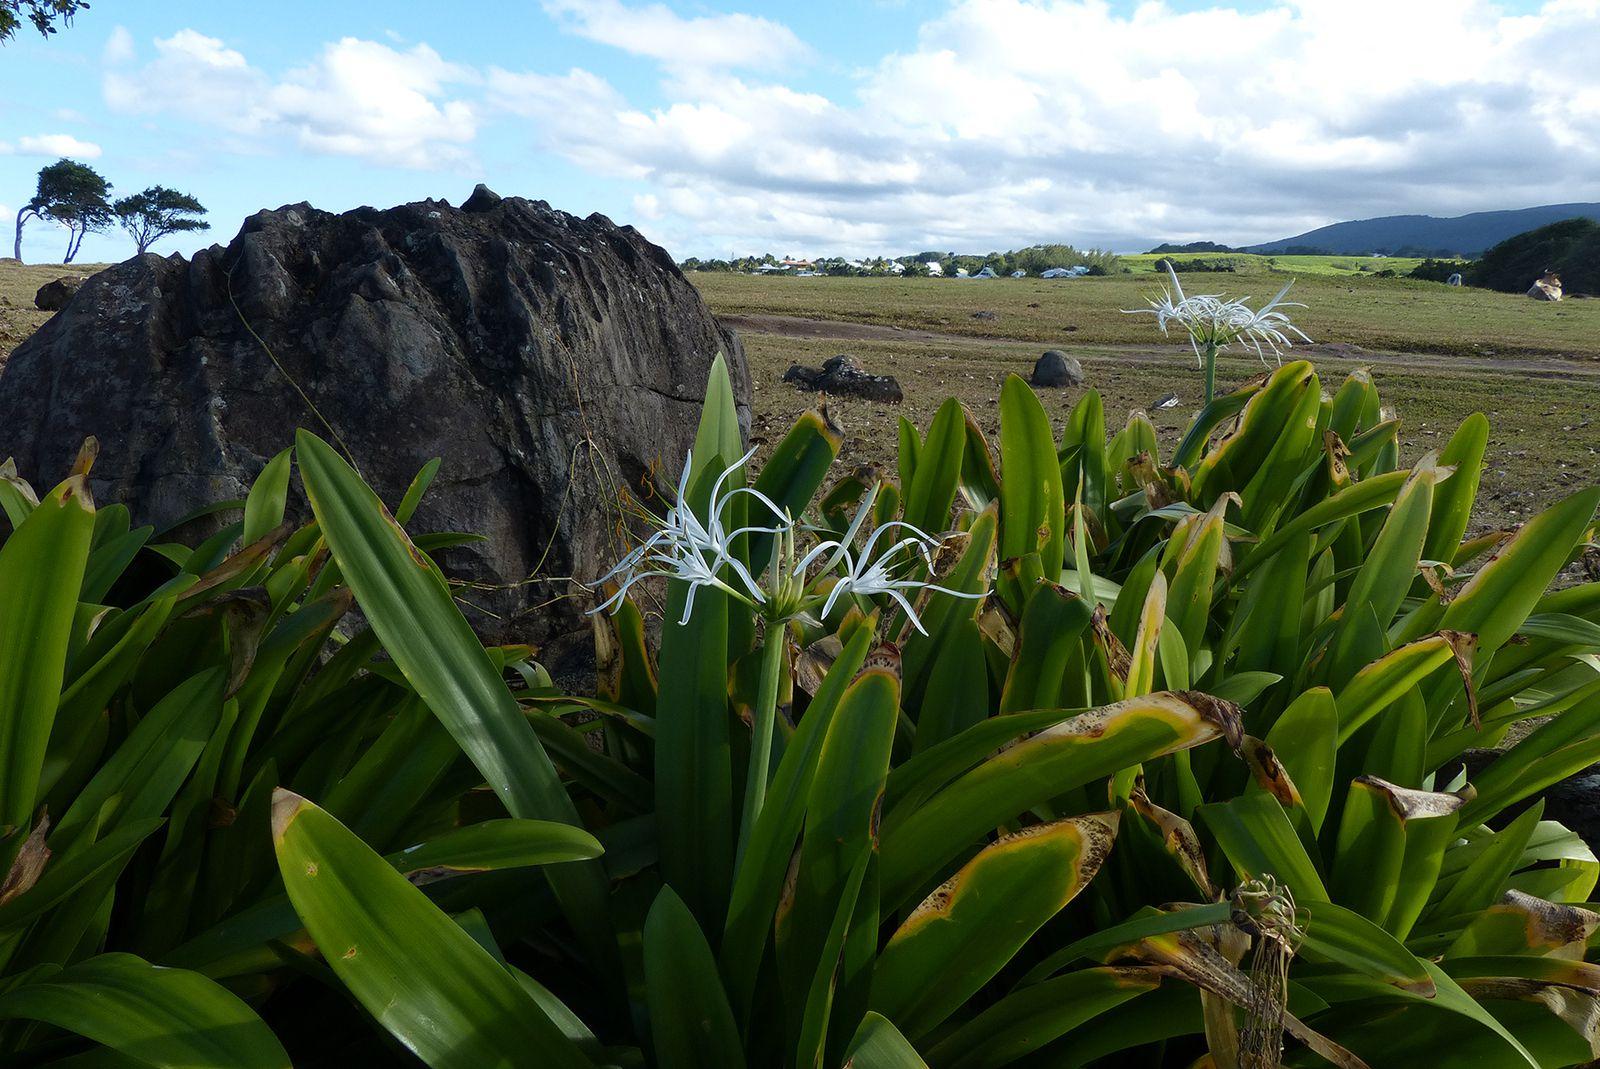 Hymenocallis caribaea (L.) Herb. au Nord de Basse-Terre en Guadeloupe